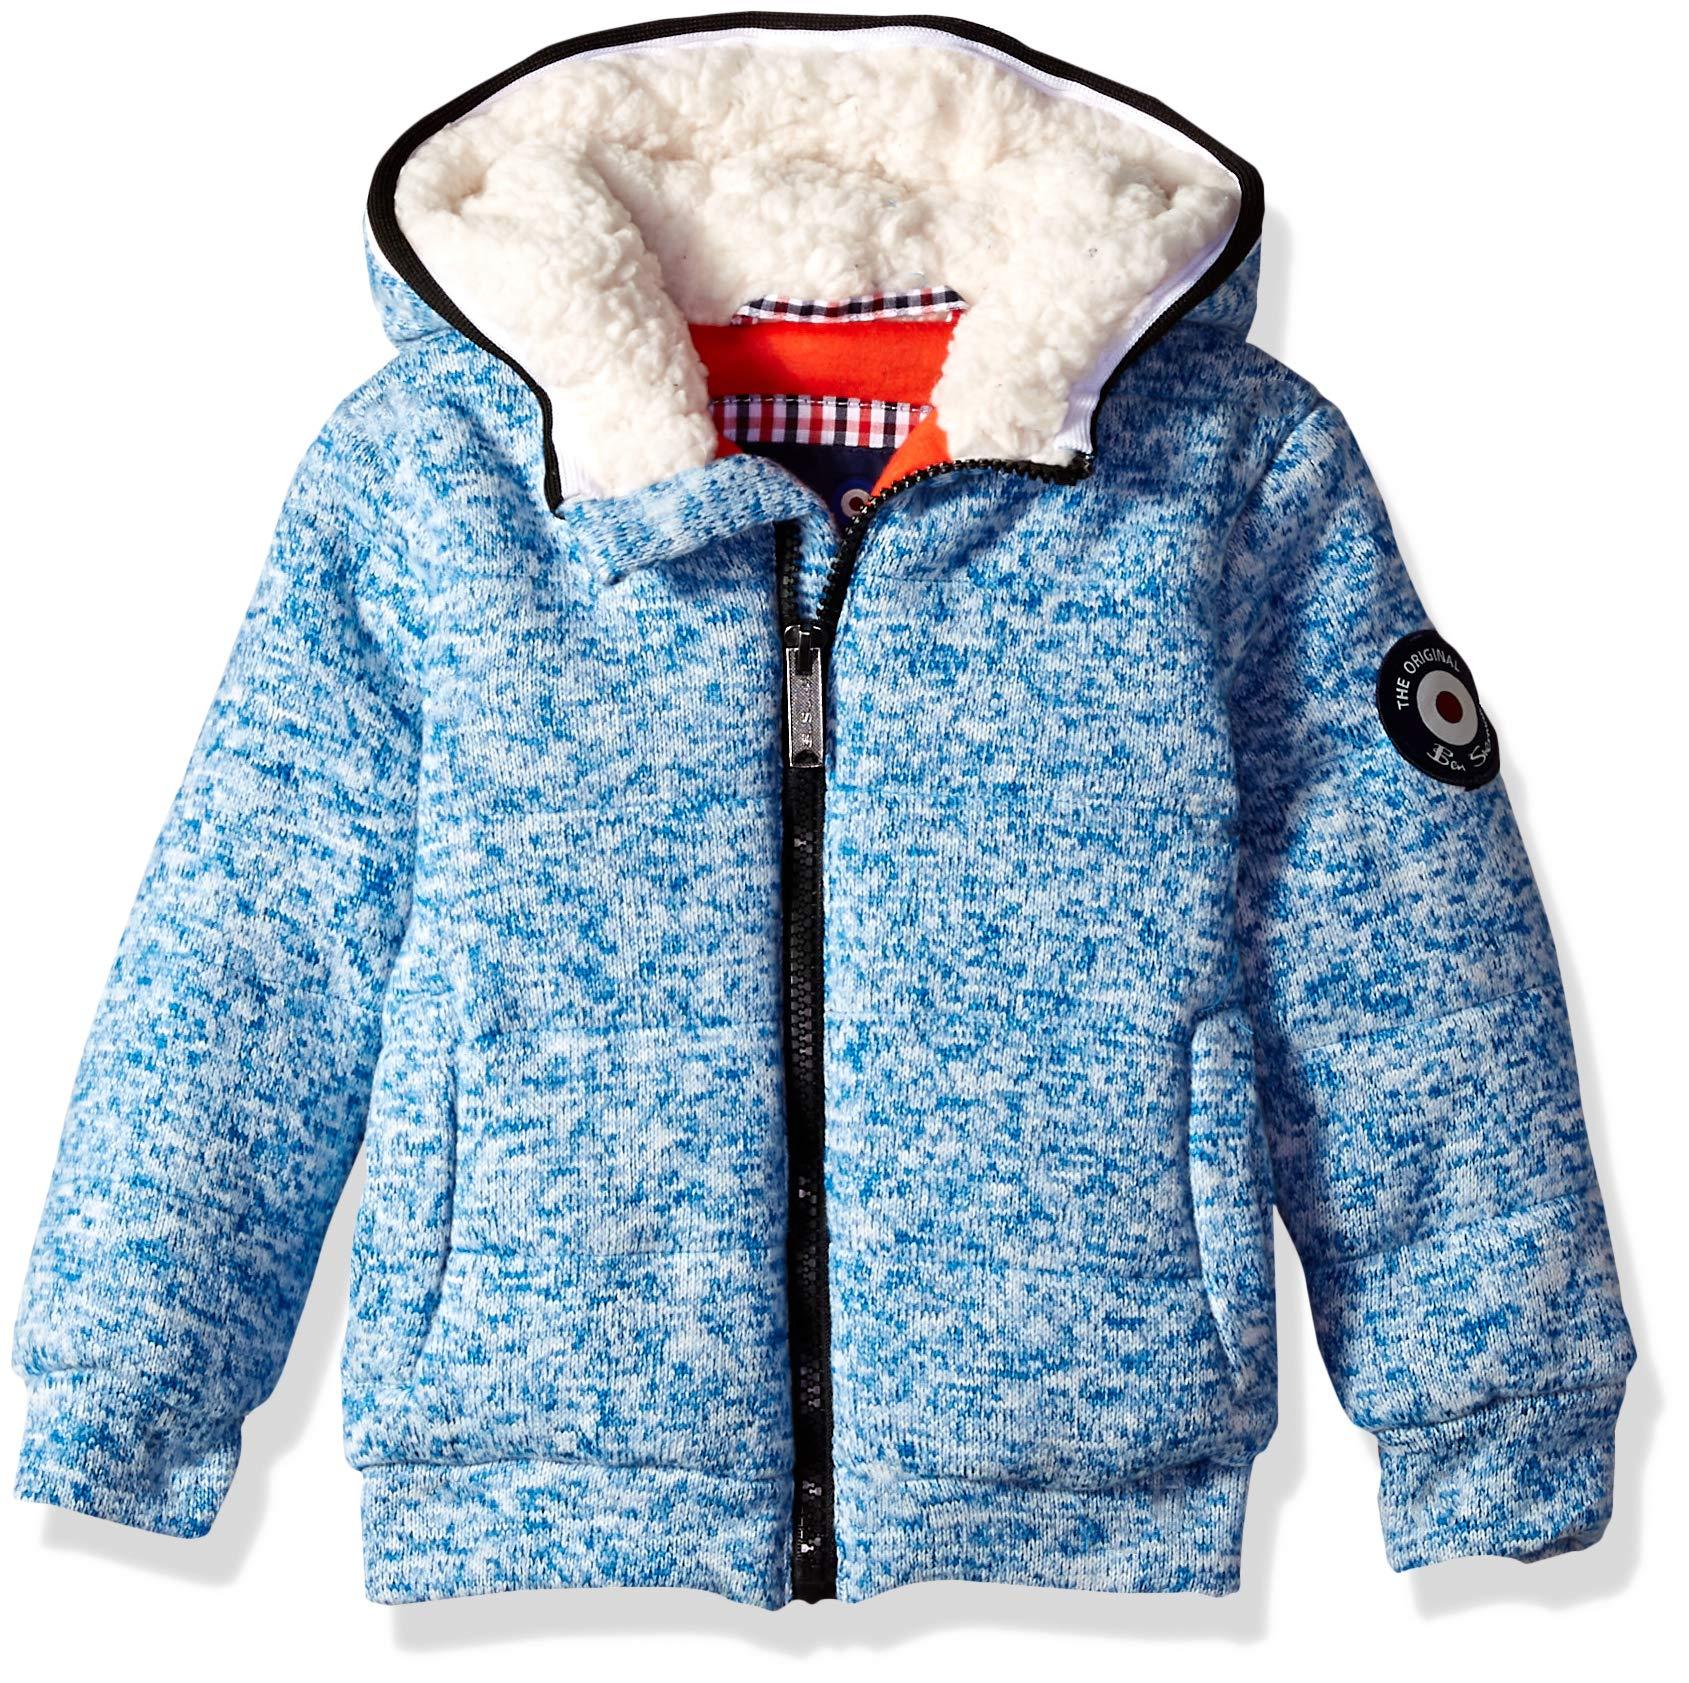 Ben Sherman Boys' Toddler Sweater Fleece Jacket, Heather Blue 4T